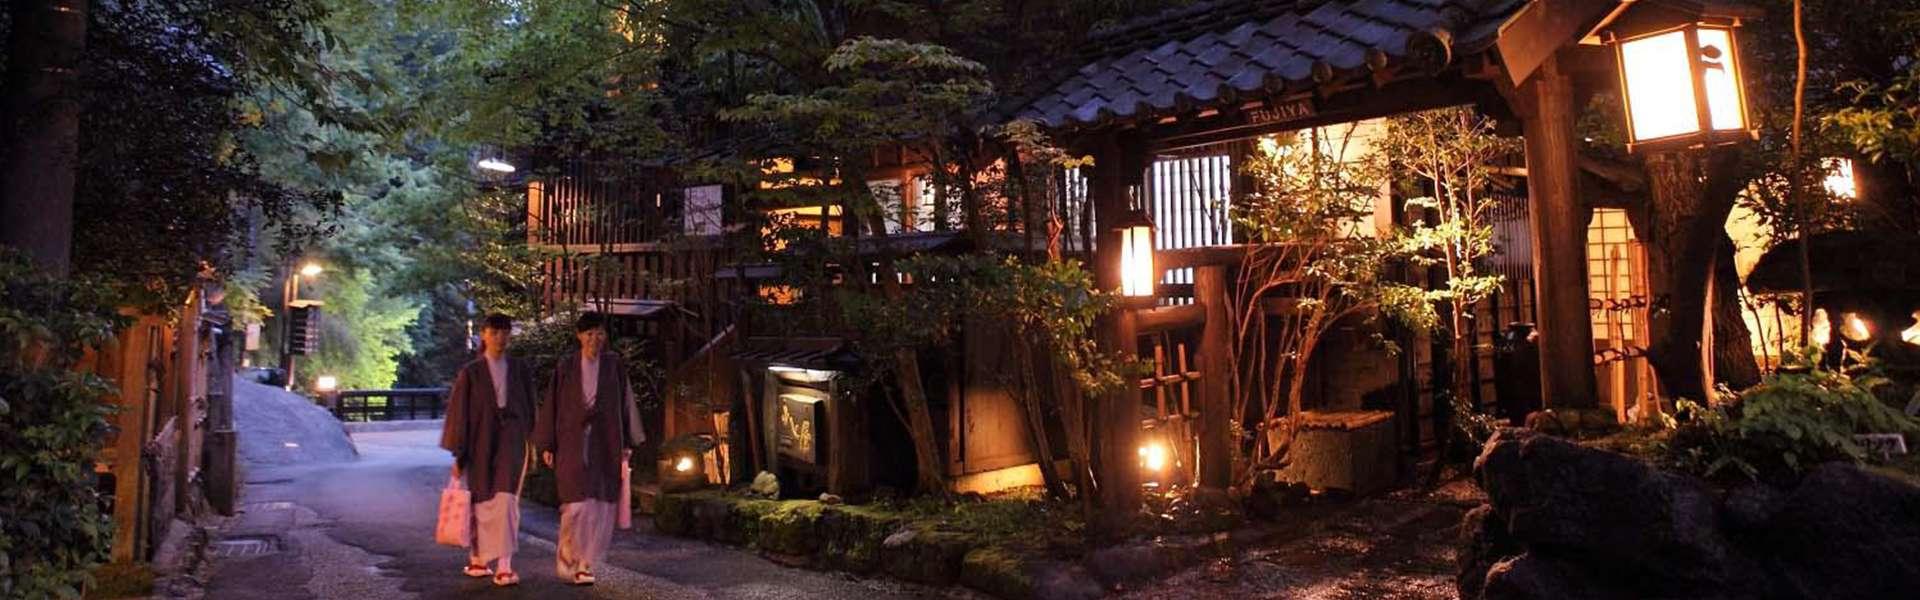 Kurokawa Onsen à Minamioguni